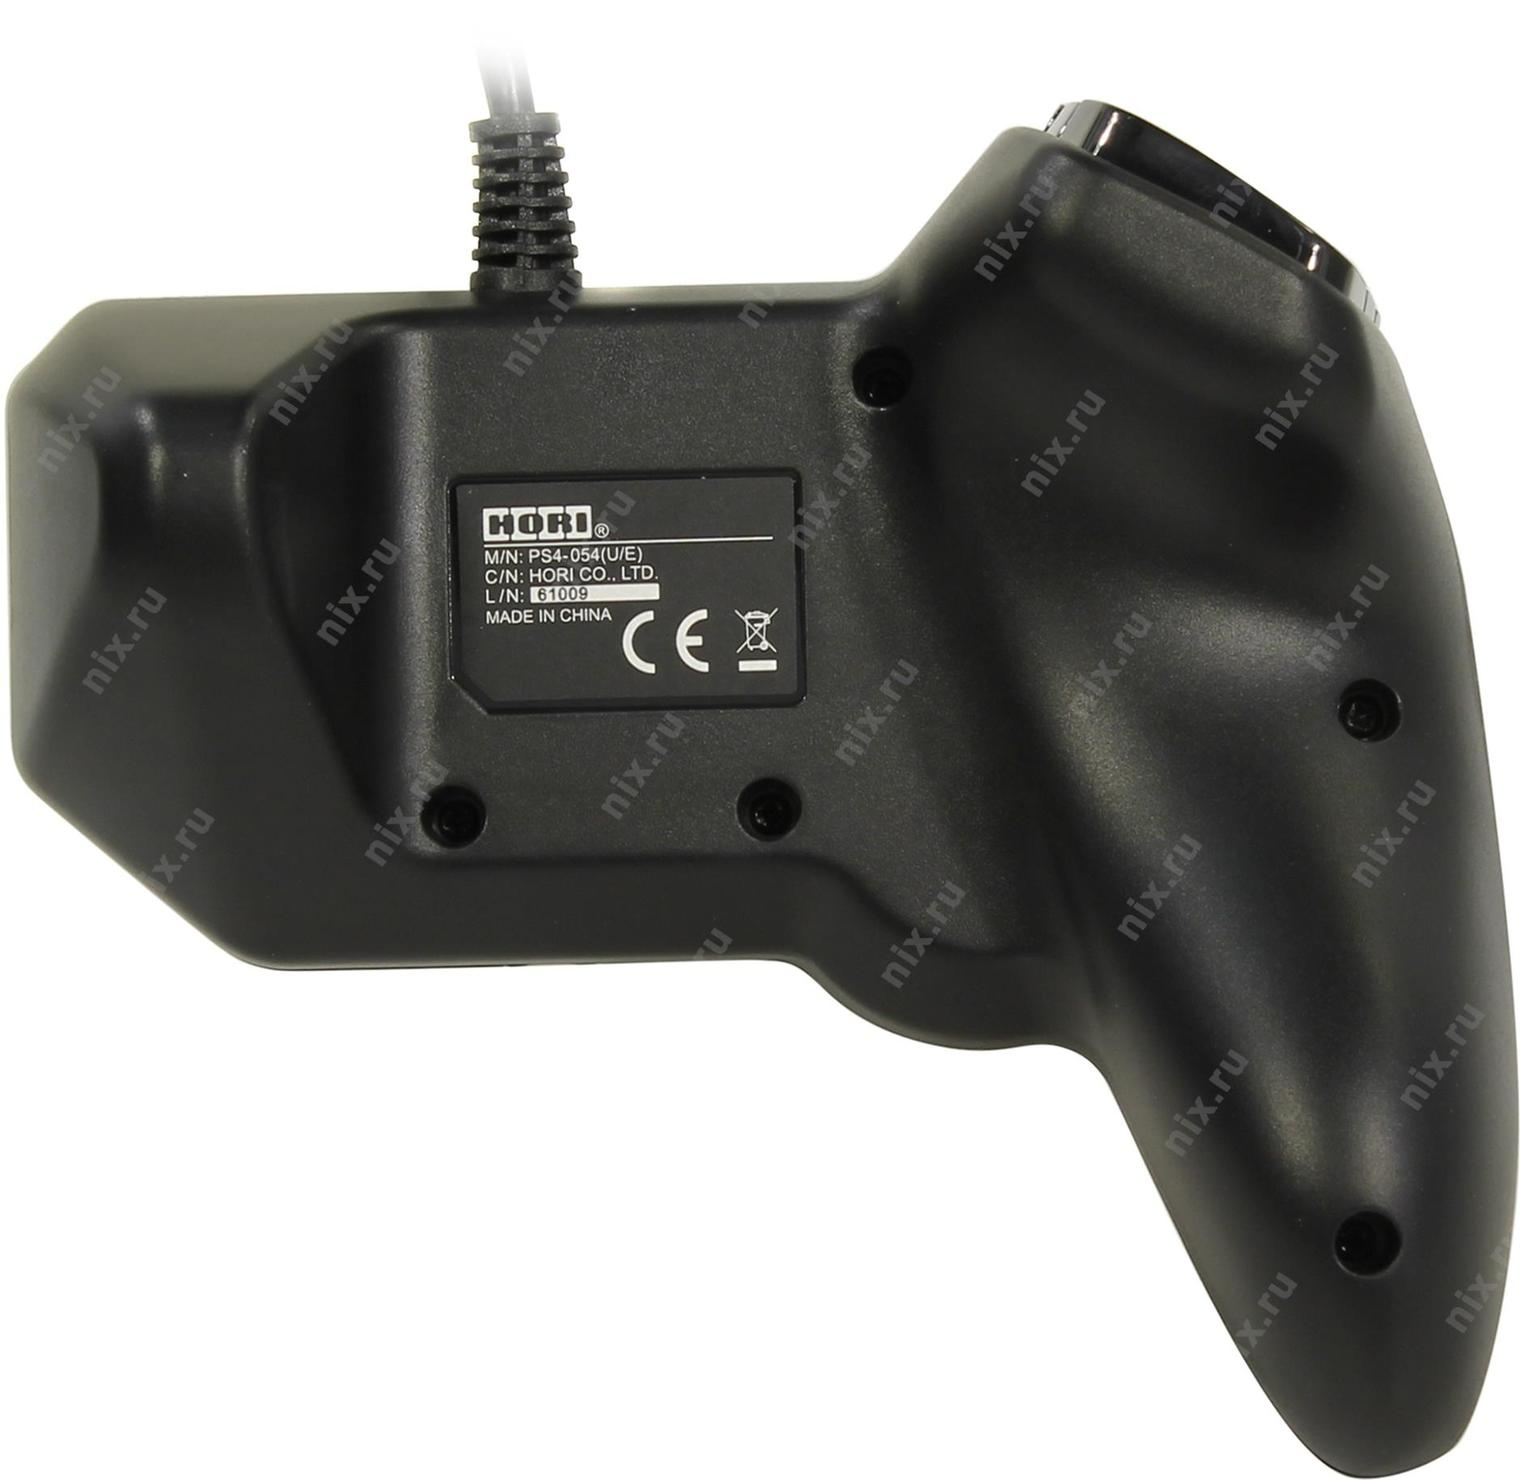 Harga Dan Spek Hori Tactical Assault Commander Grip Ps4 054e Controller Type G1 For 3